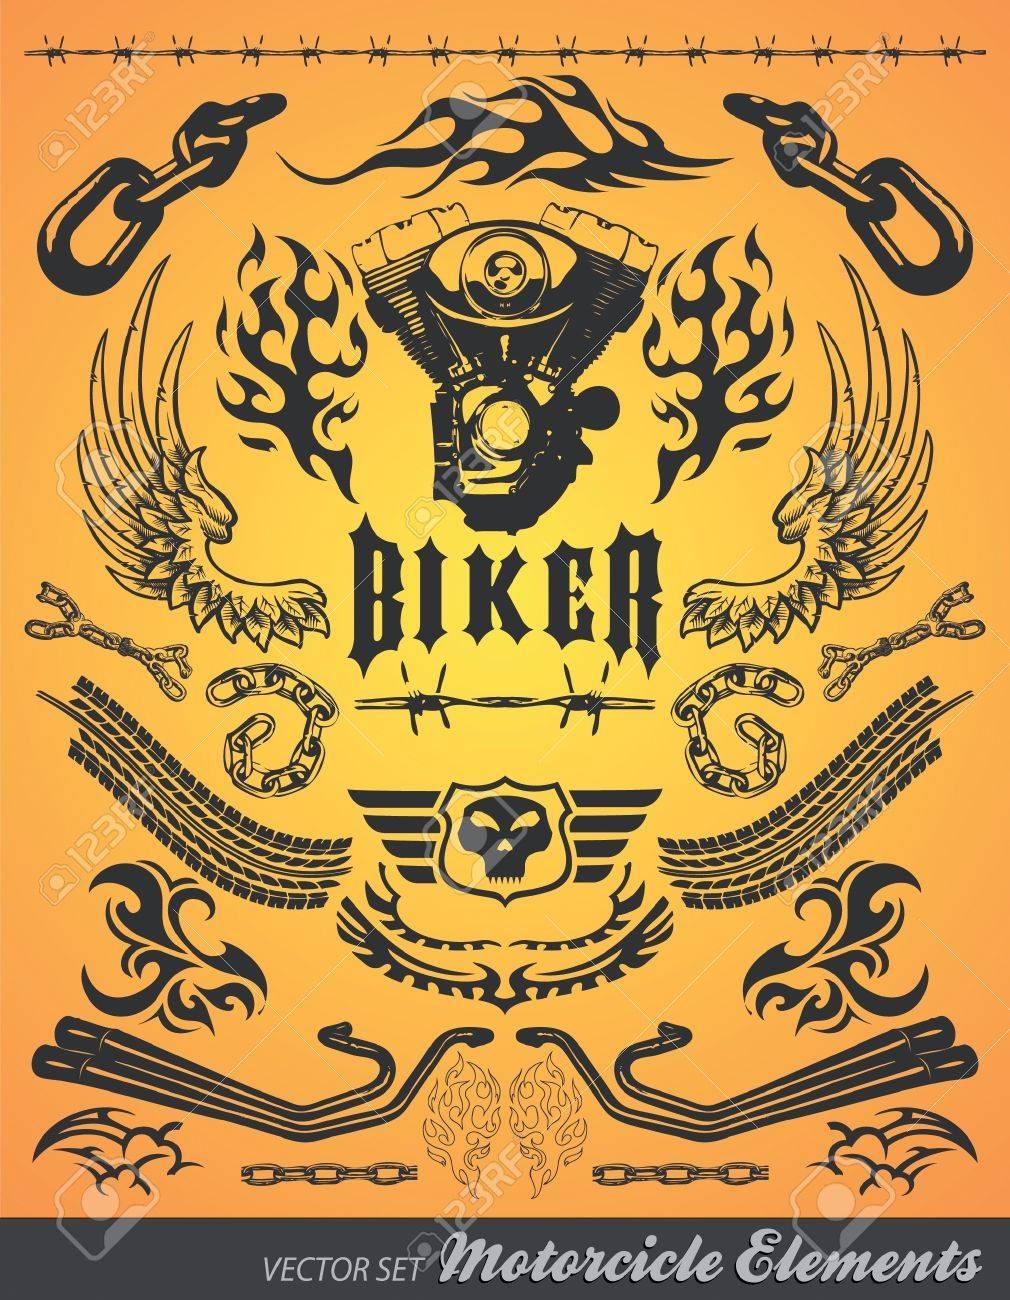 Chopper Motorcycle elements vector Stock Vector - 16599546